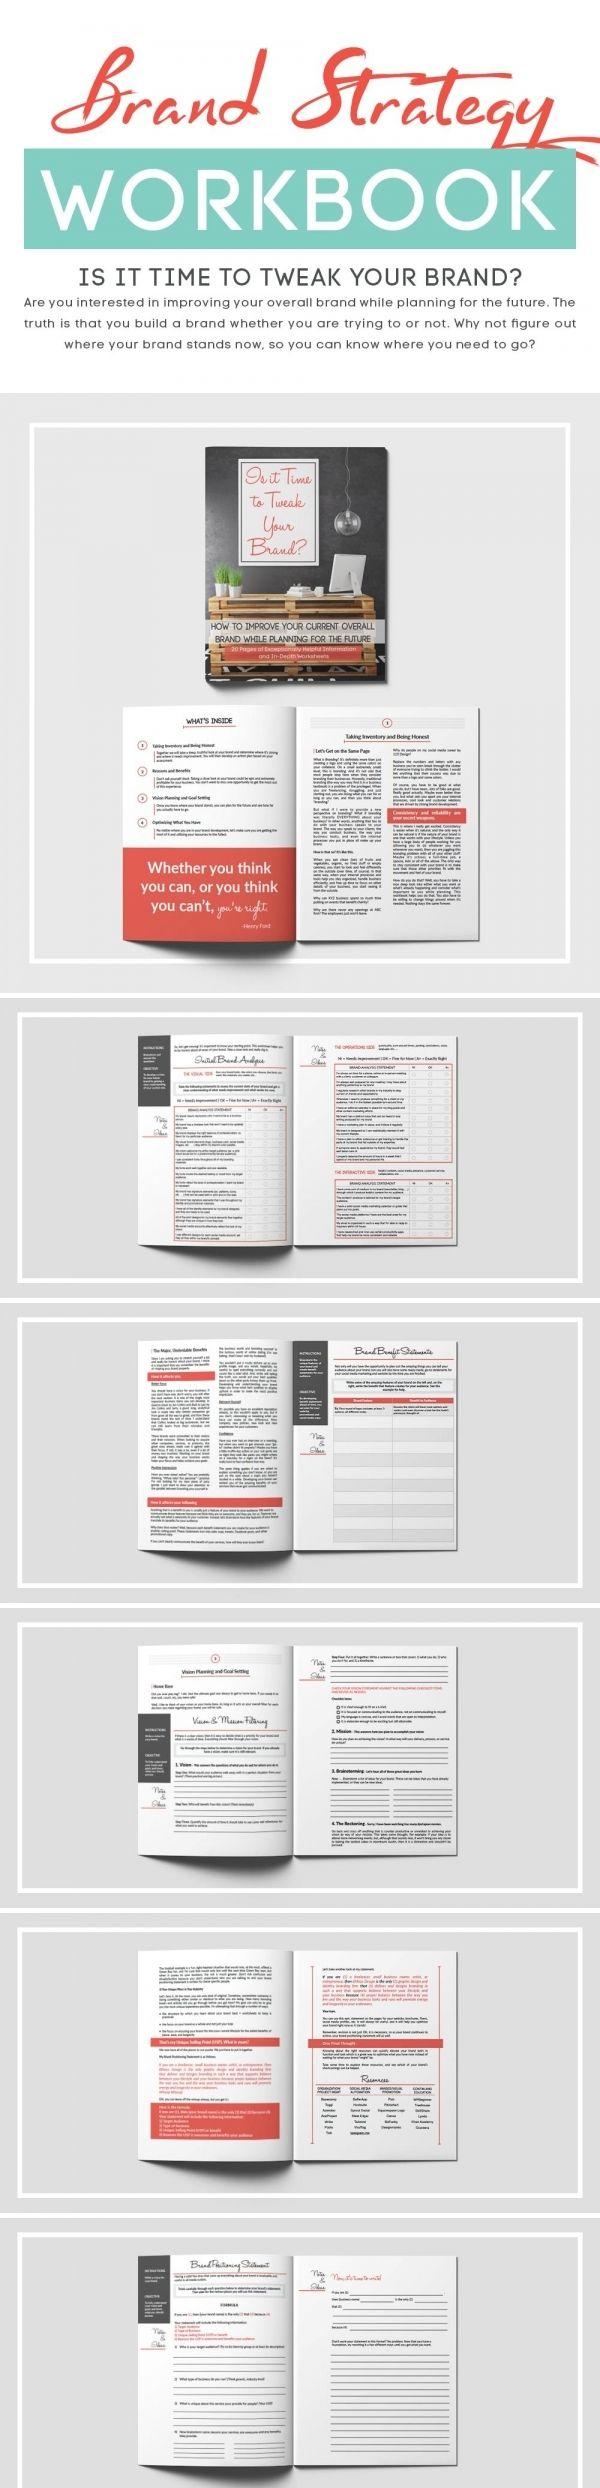 mission statement template te hakk nda den fazla fikir is it time to tweak your brand workbook take inventory of your current